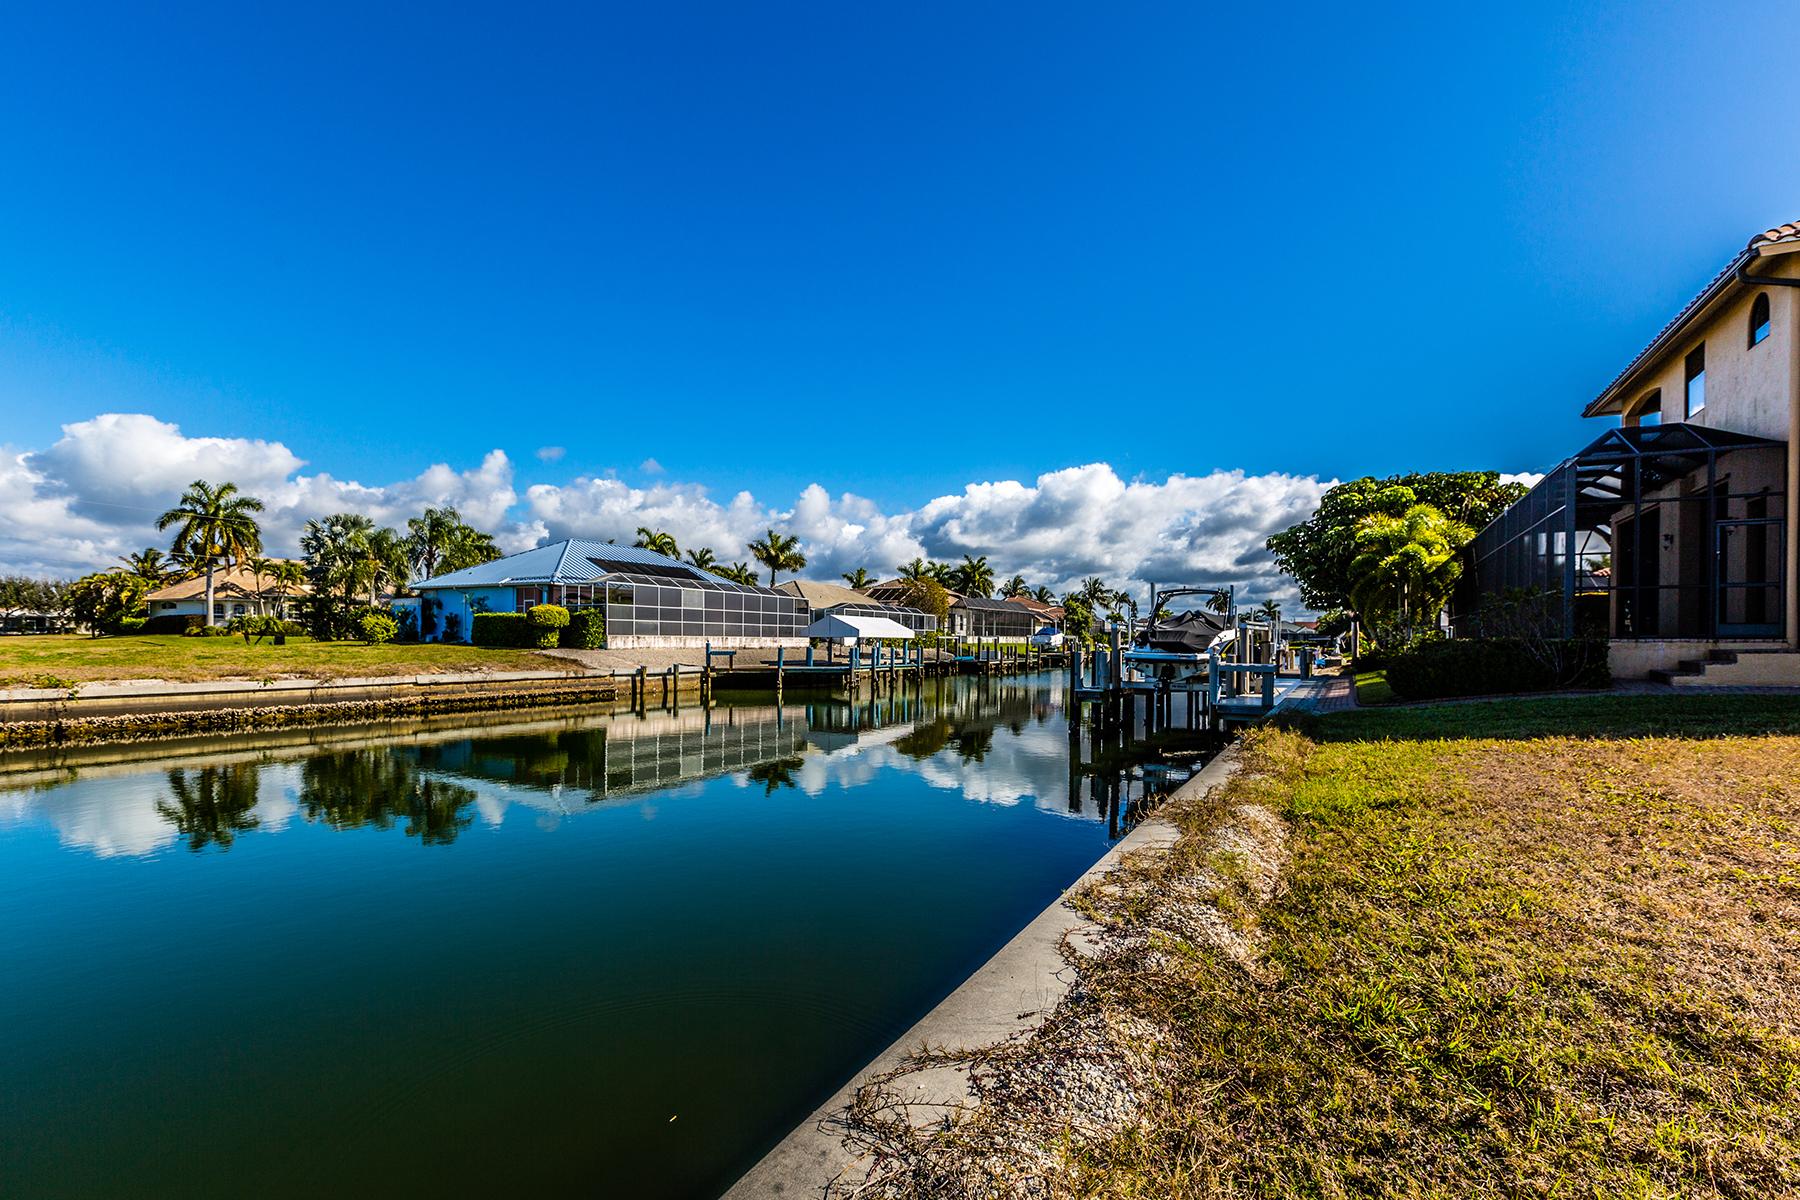 Terreno para Venda às MARCO ISLAND 1080 Dana Ct Marco Island, Florida, 34145 Estados Unidos